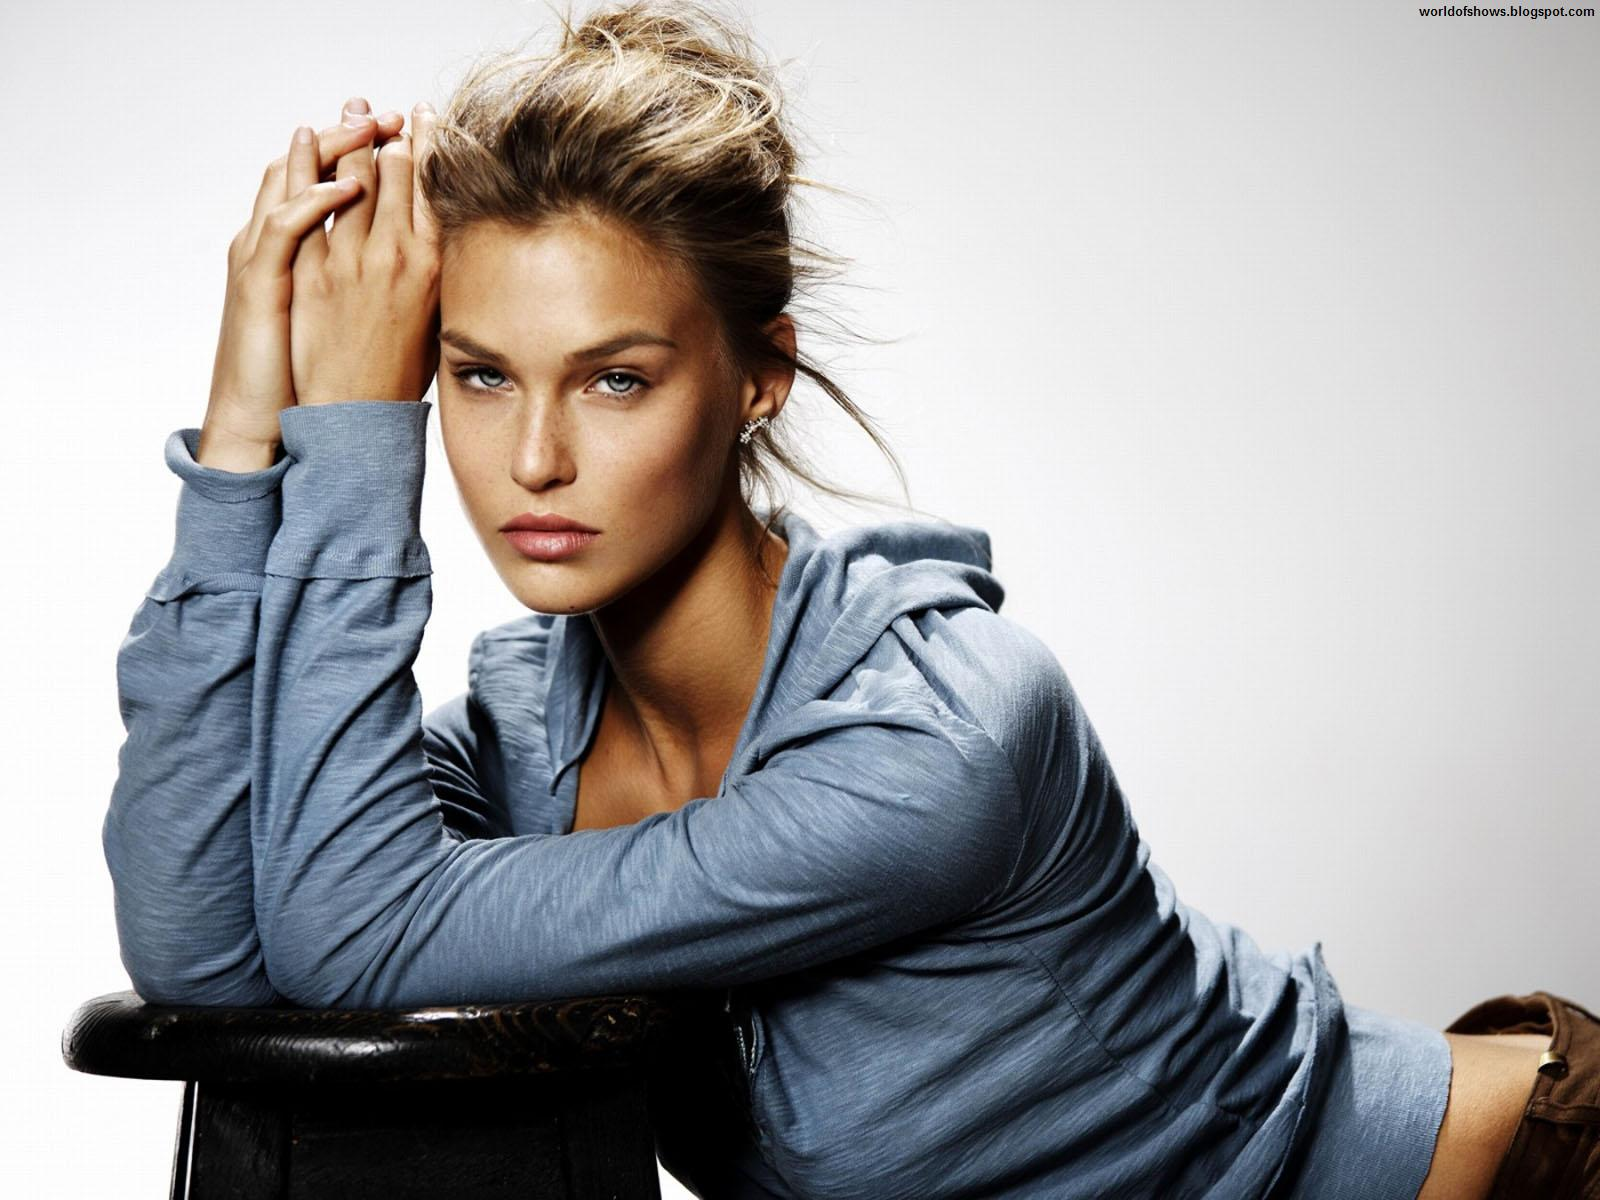 http://3.bp.blogspot.com/-8YY4fbOhIe8/UA_Vq5ldAVI/AAAAAAAAG7c/saXkD8k3_z0/s1600/Bar_Refaeli_Sexy_Israeli_Model_And_Actress_Blonde_Bomb_Sports_Illustrated_Hd_Desktop_Wallpaper_worldofshows.blogspot.com.jpg